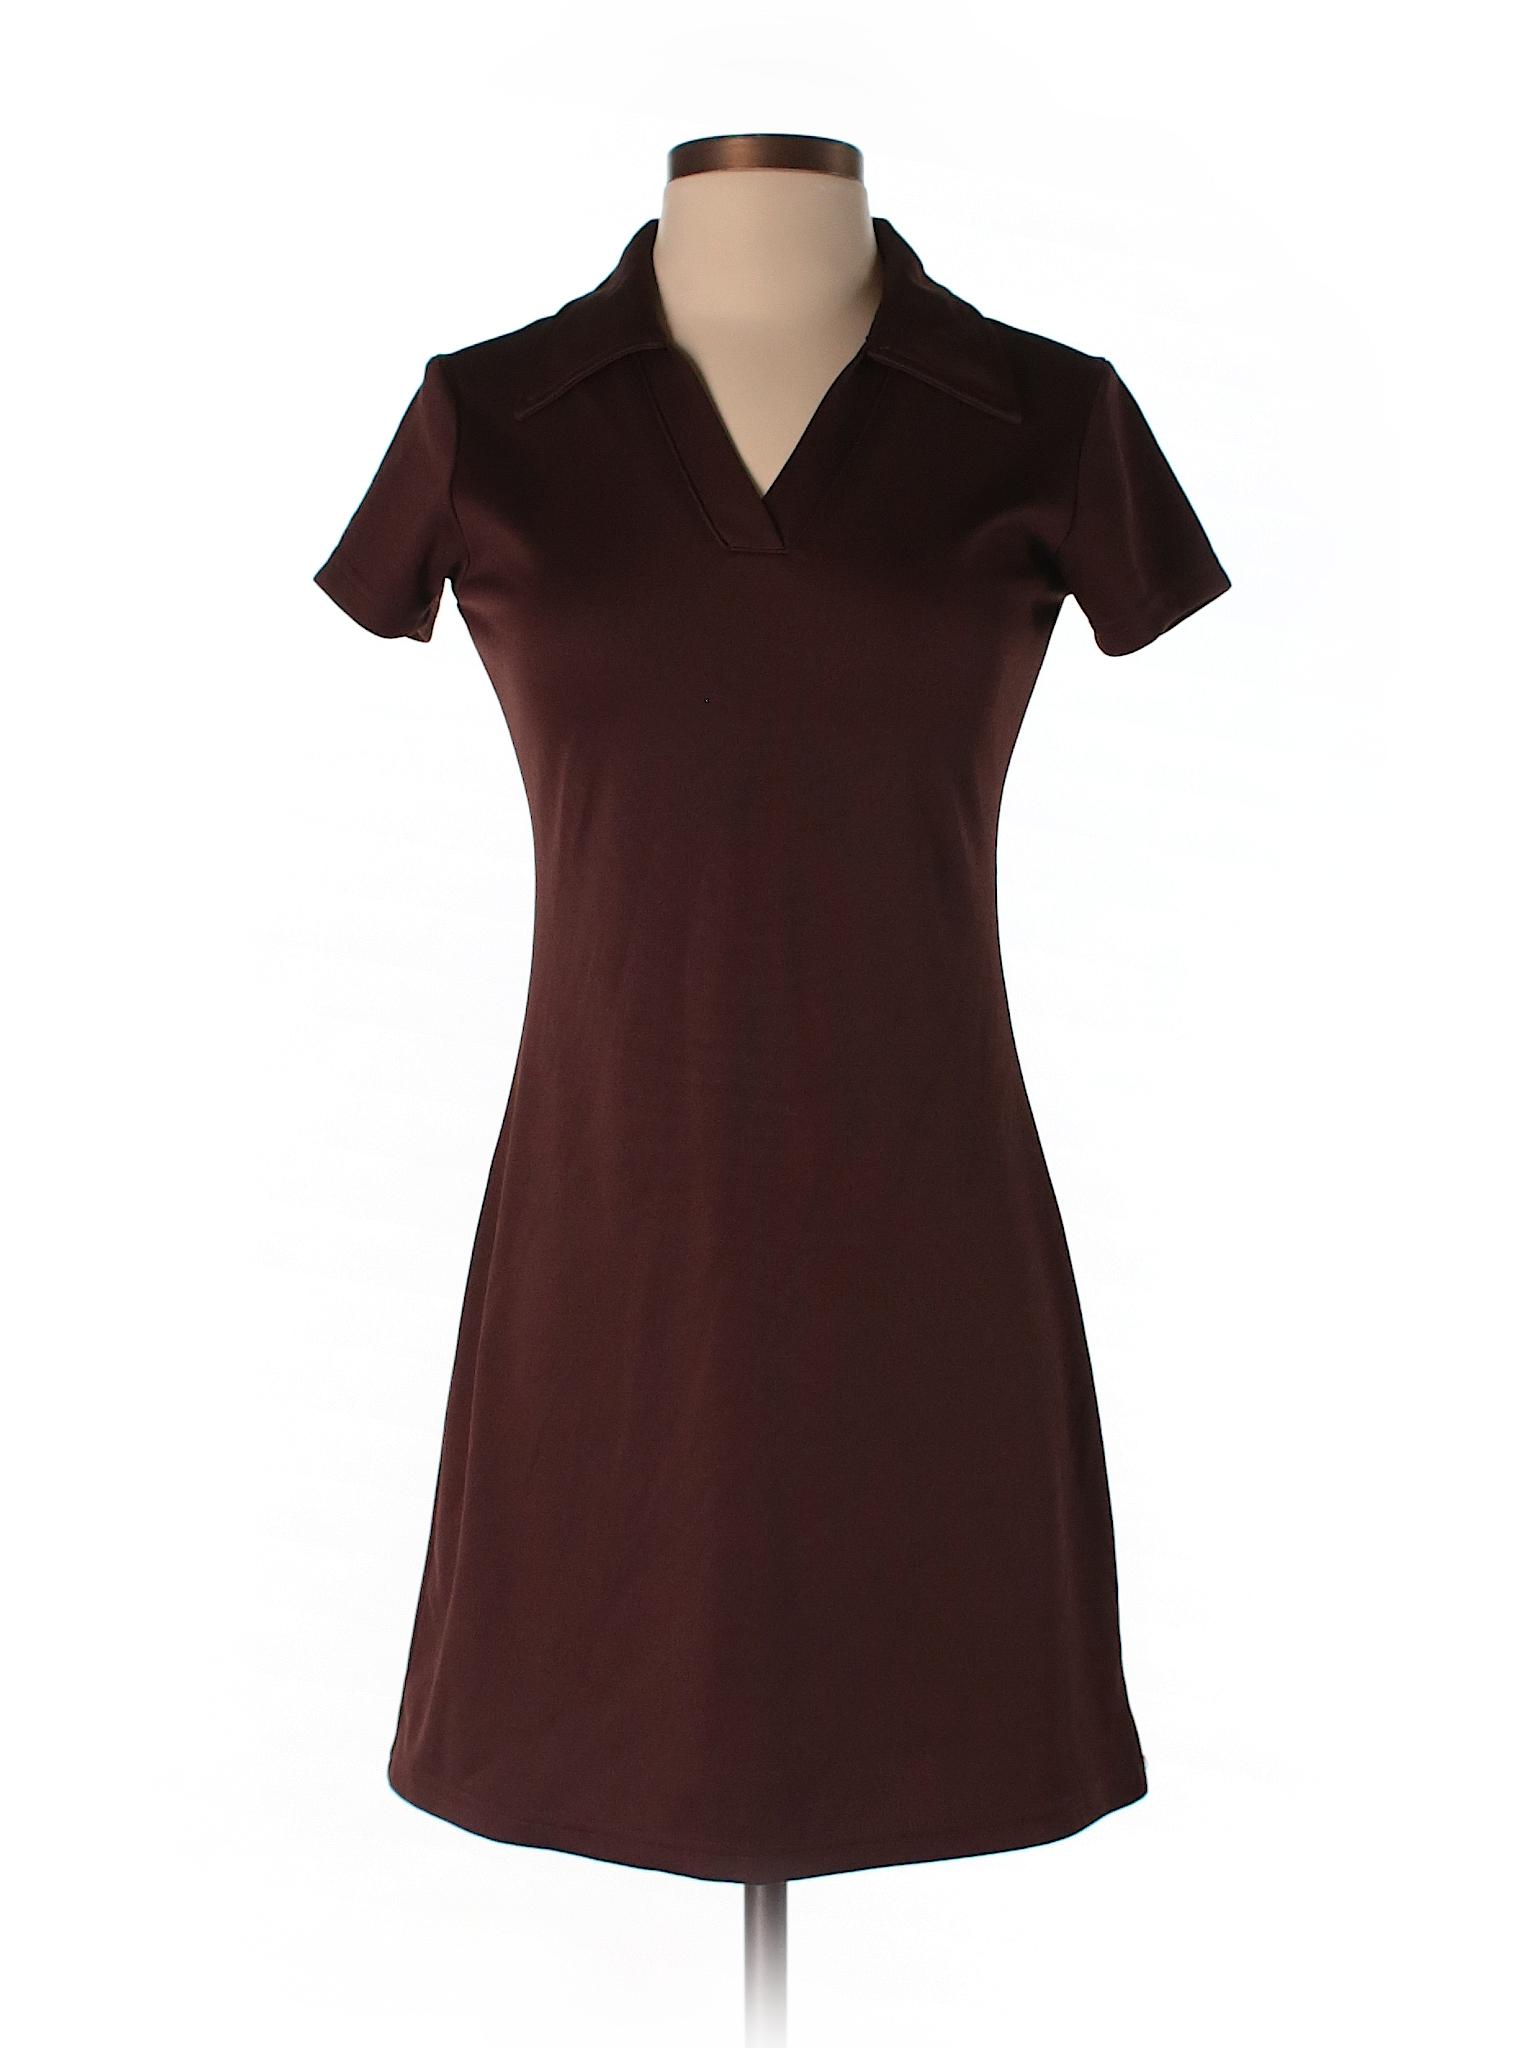 Casual Factory Store Banana Dress Selling Republic qE8Iw7S